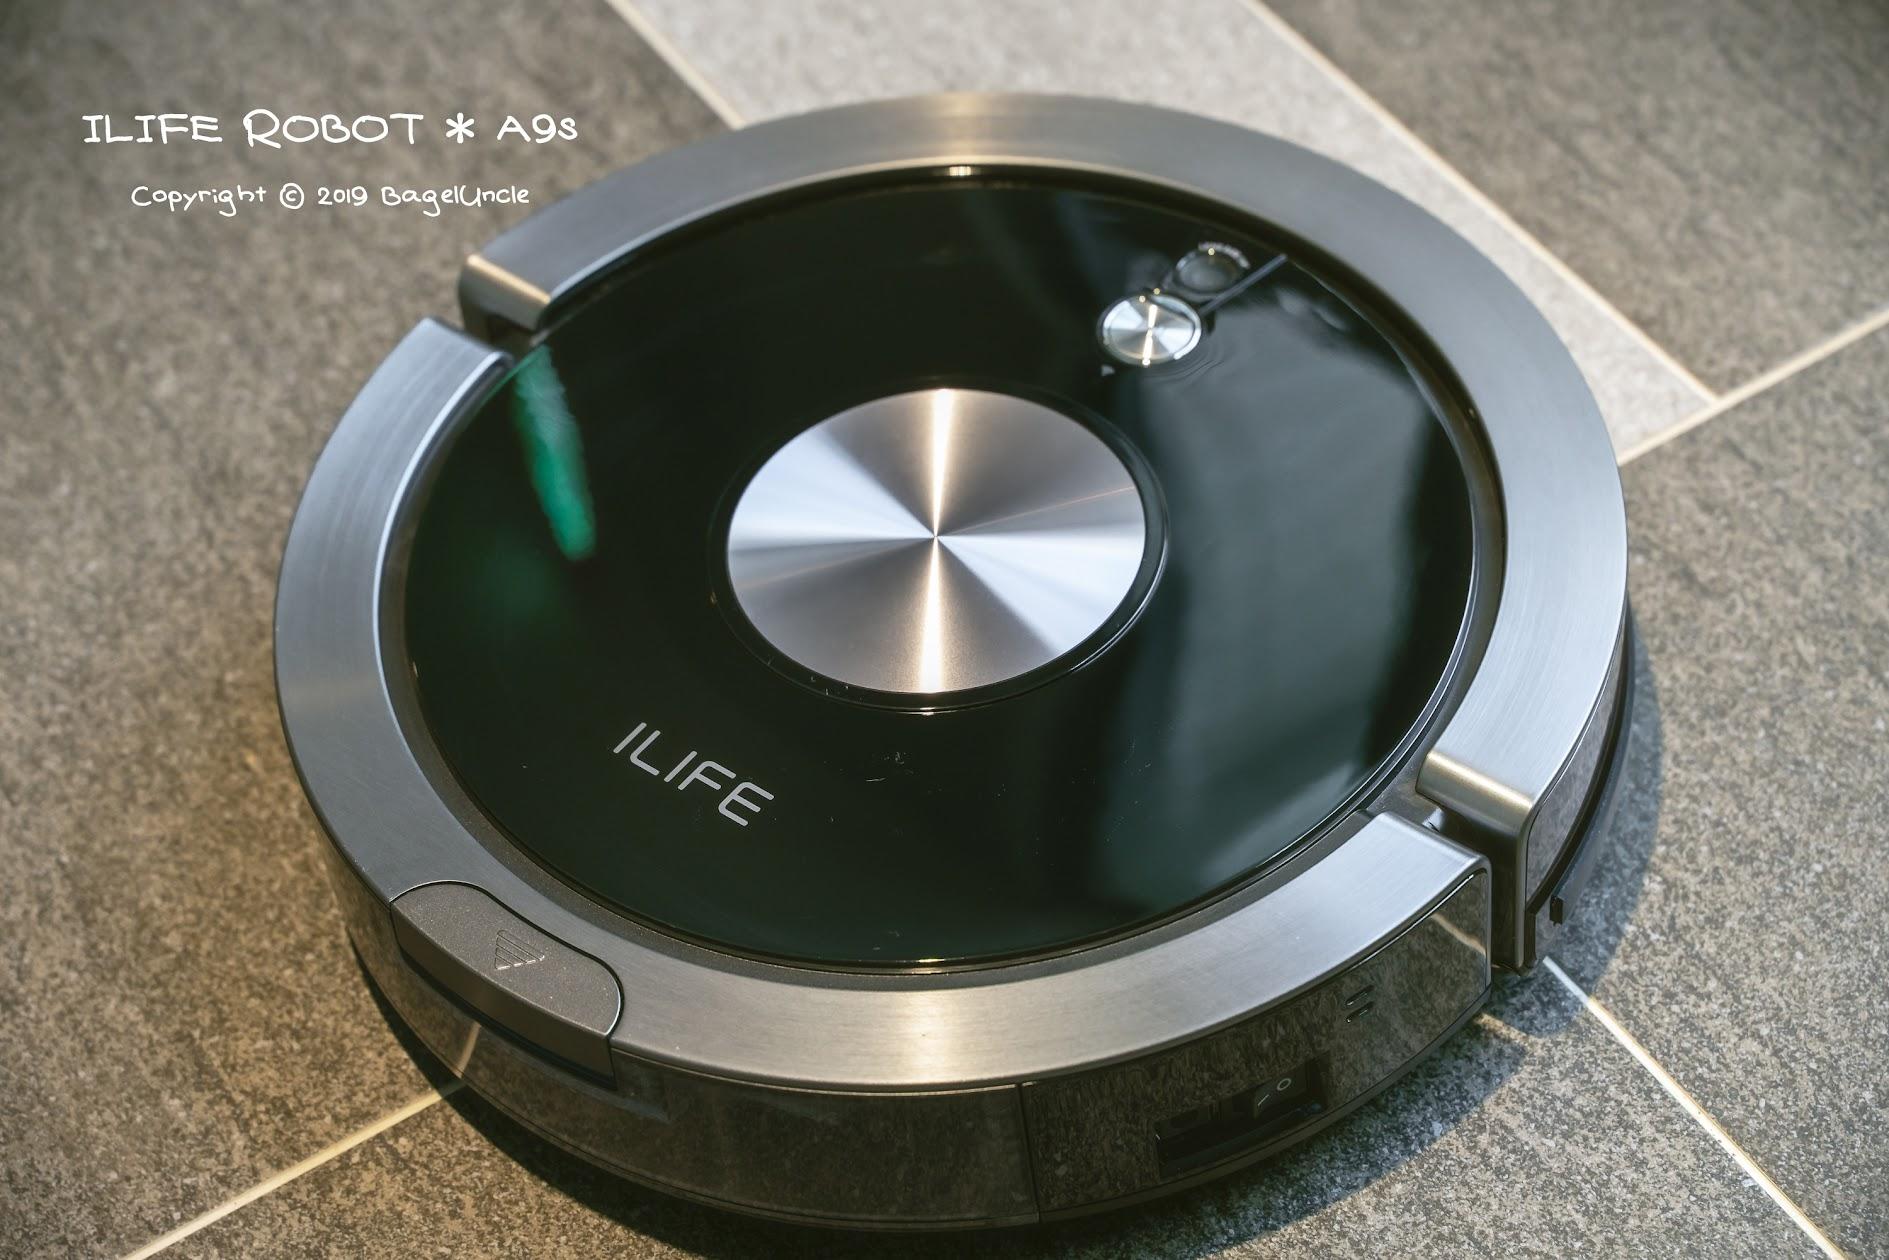 【3C開箱】ILIFE A9s 全球第一台『擬人手搓拖地』掃地兩用機器人 搭配前景導航+震動水箱  吸塵、拖地再升級(有影片)